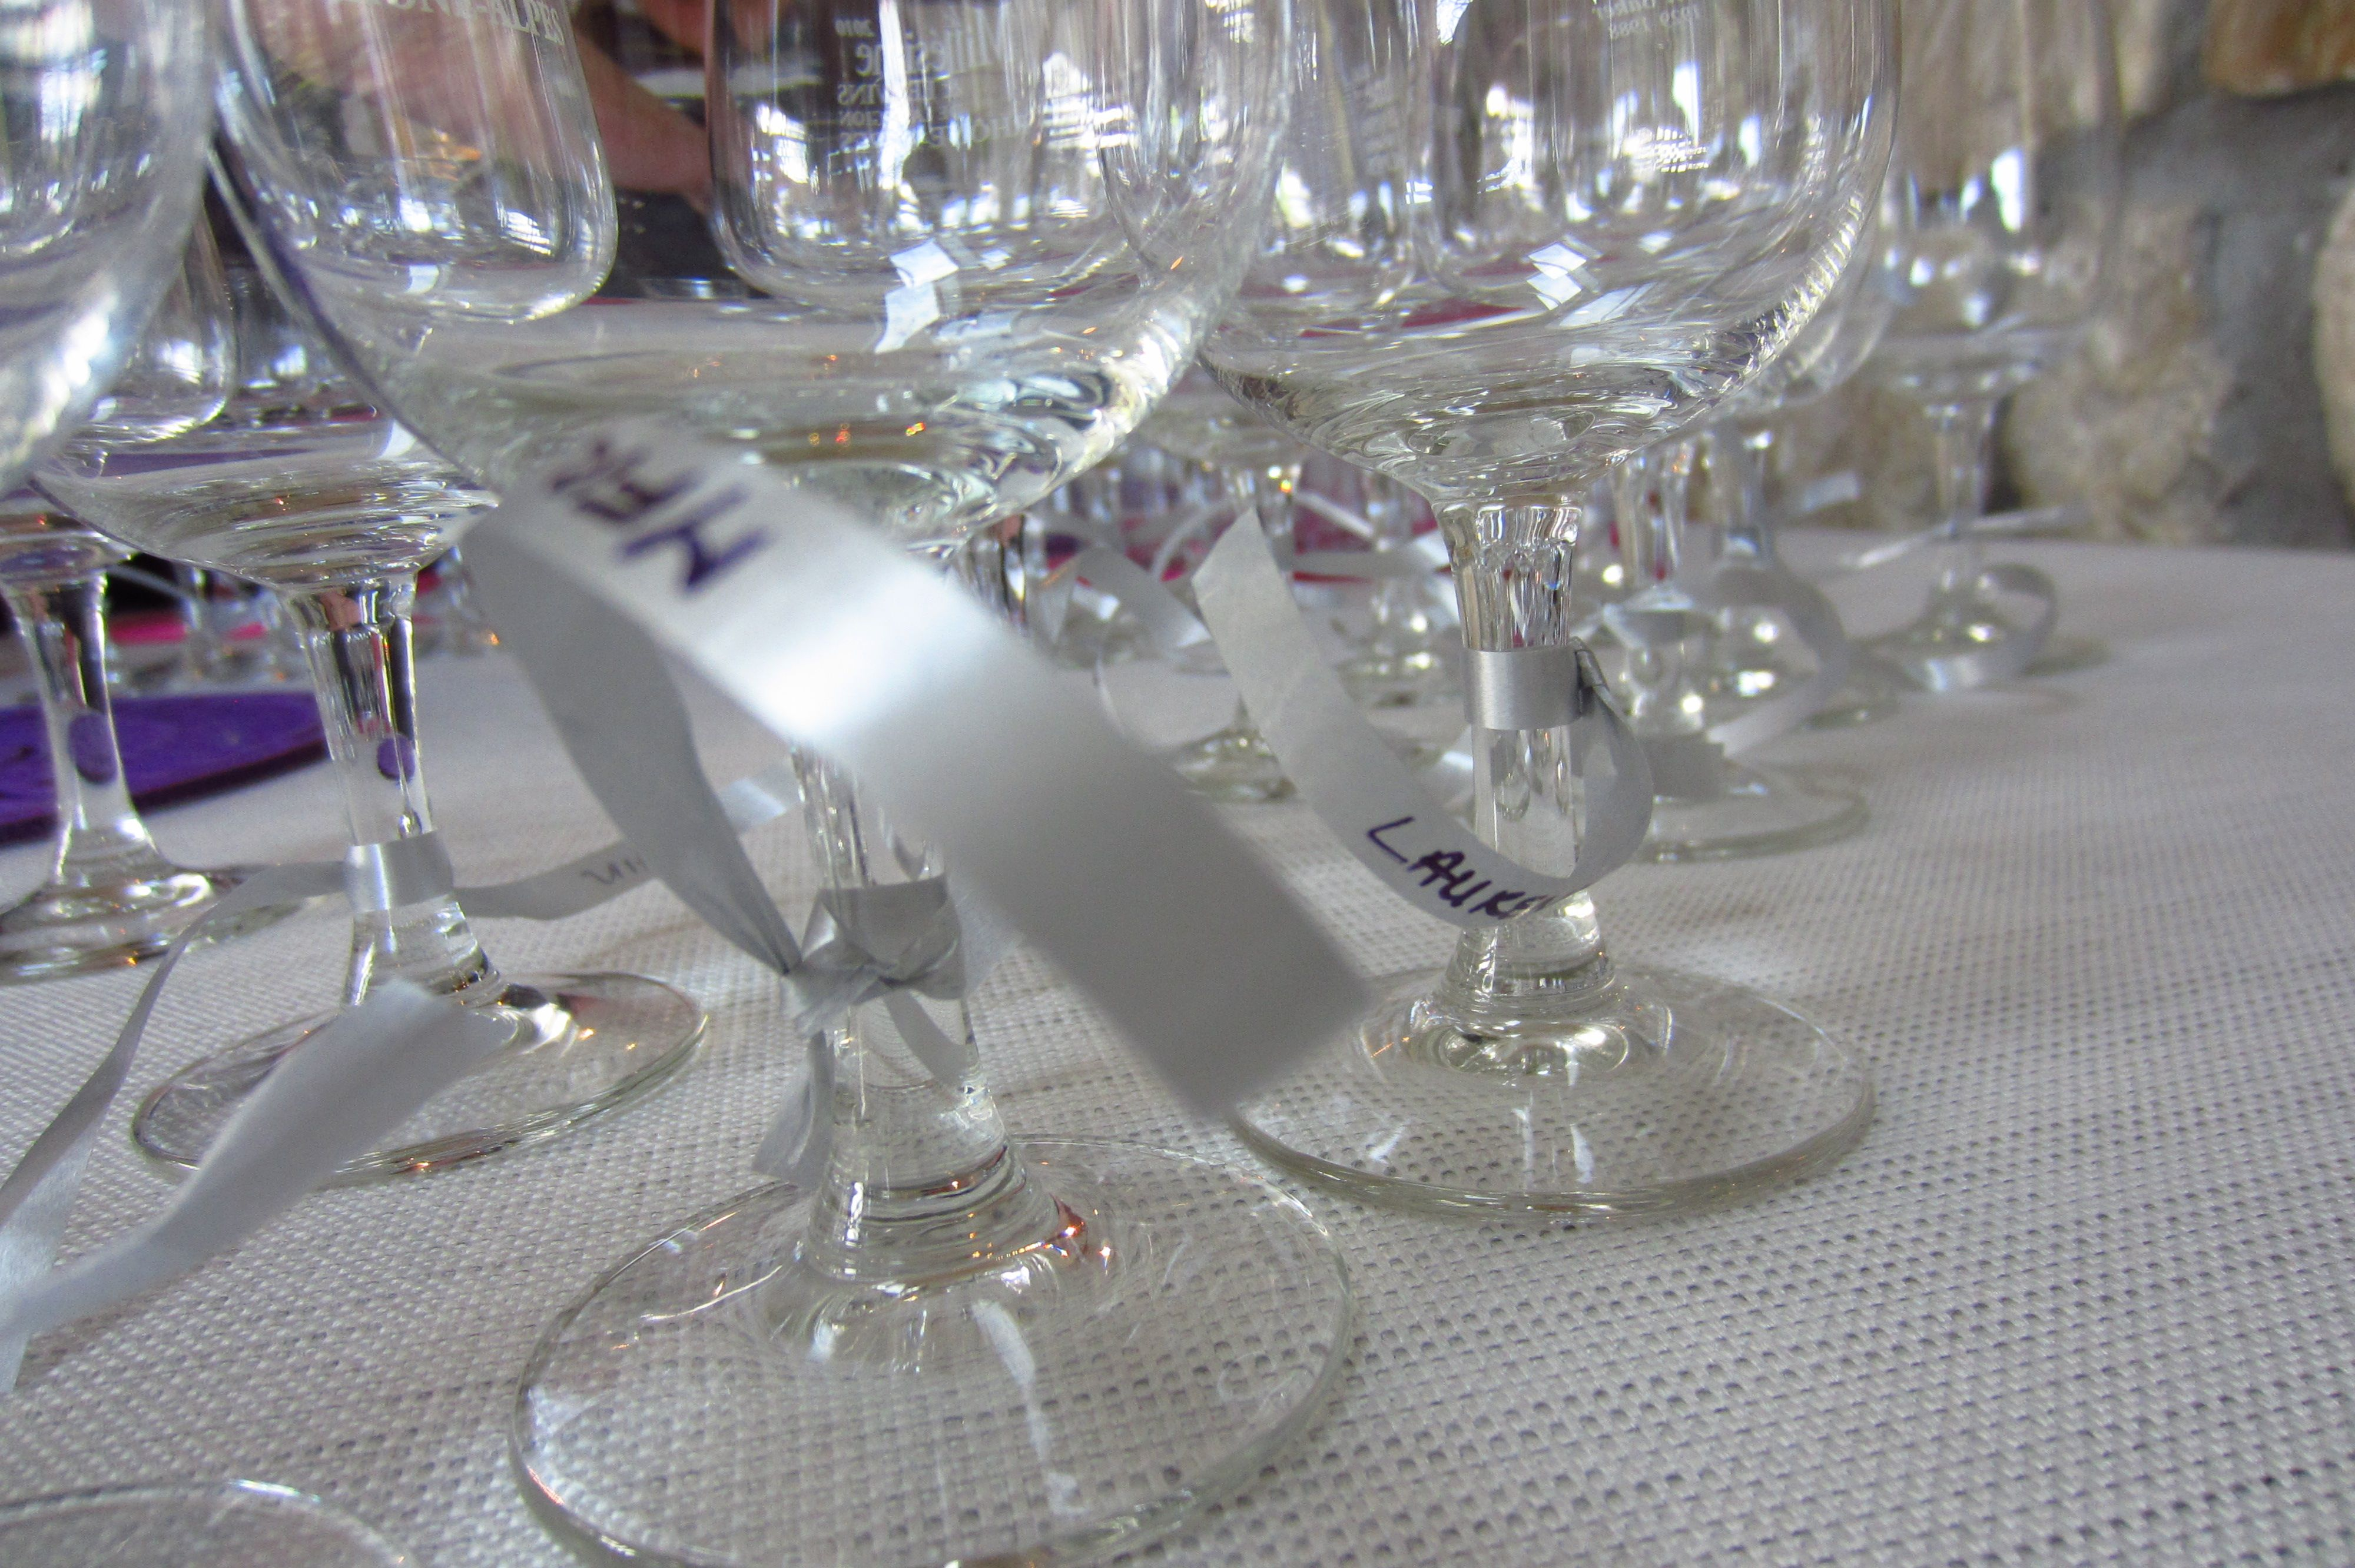 Marquer les verres avec du bolduc